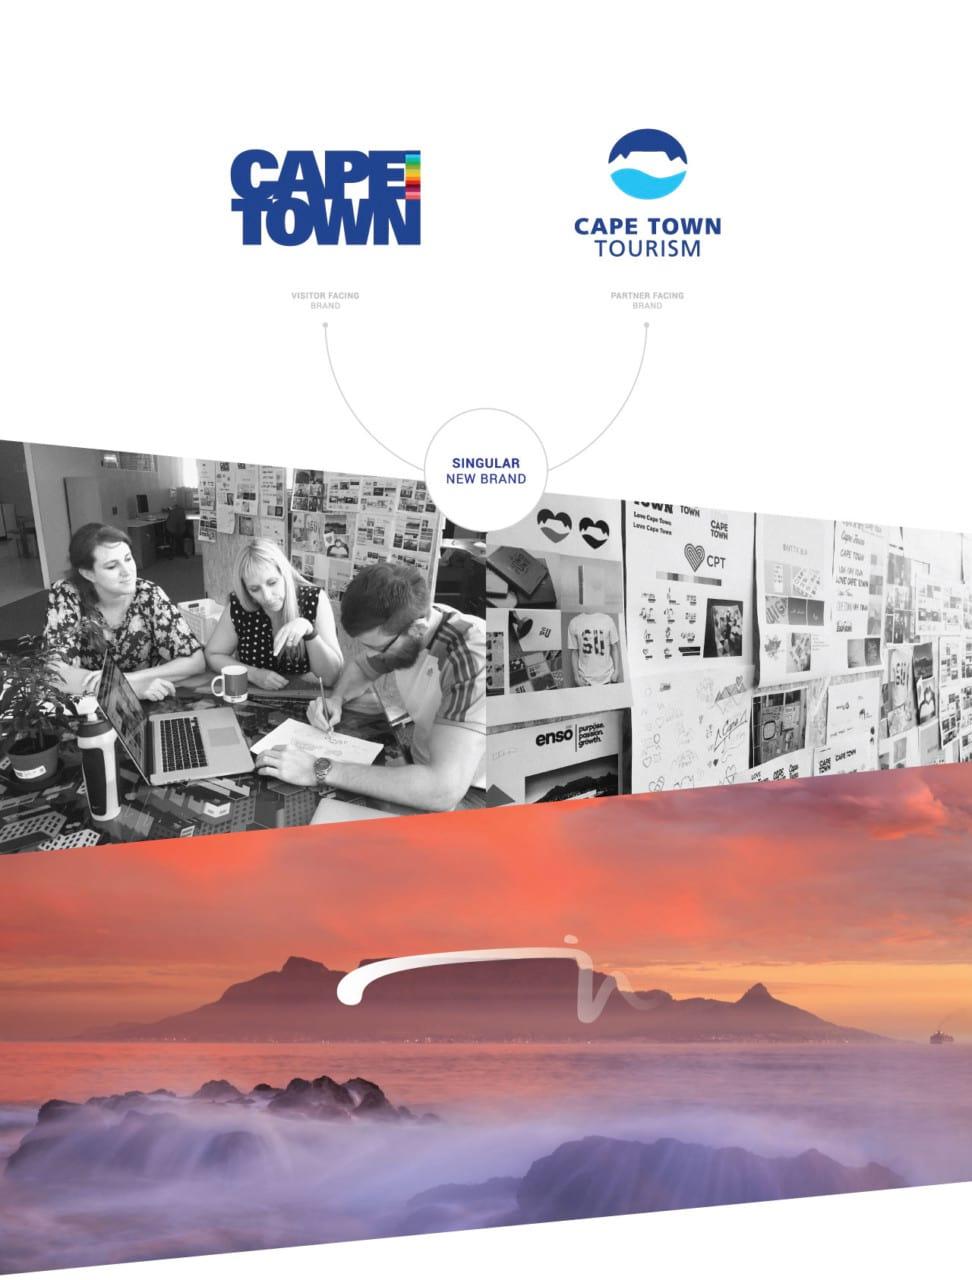 Cape Town Tourism brand Case study